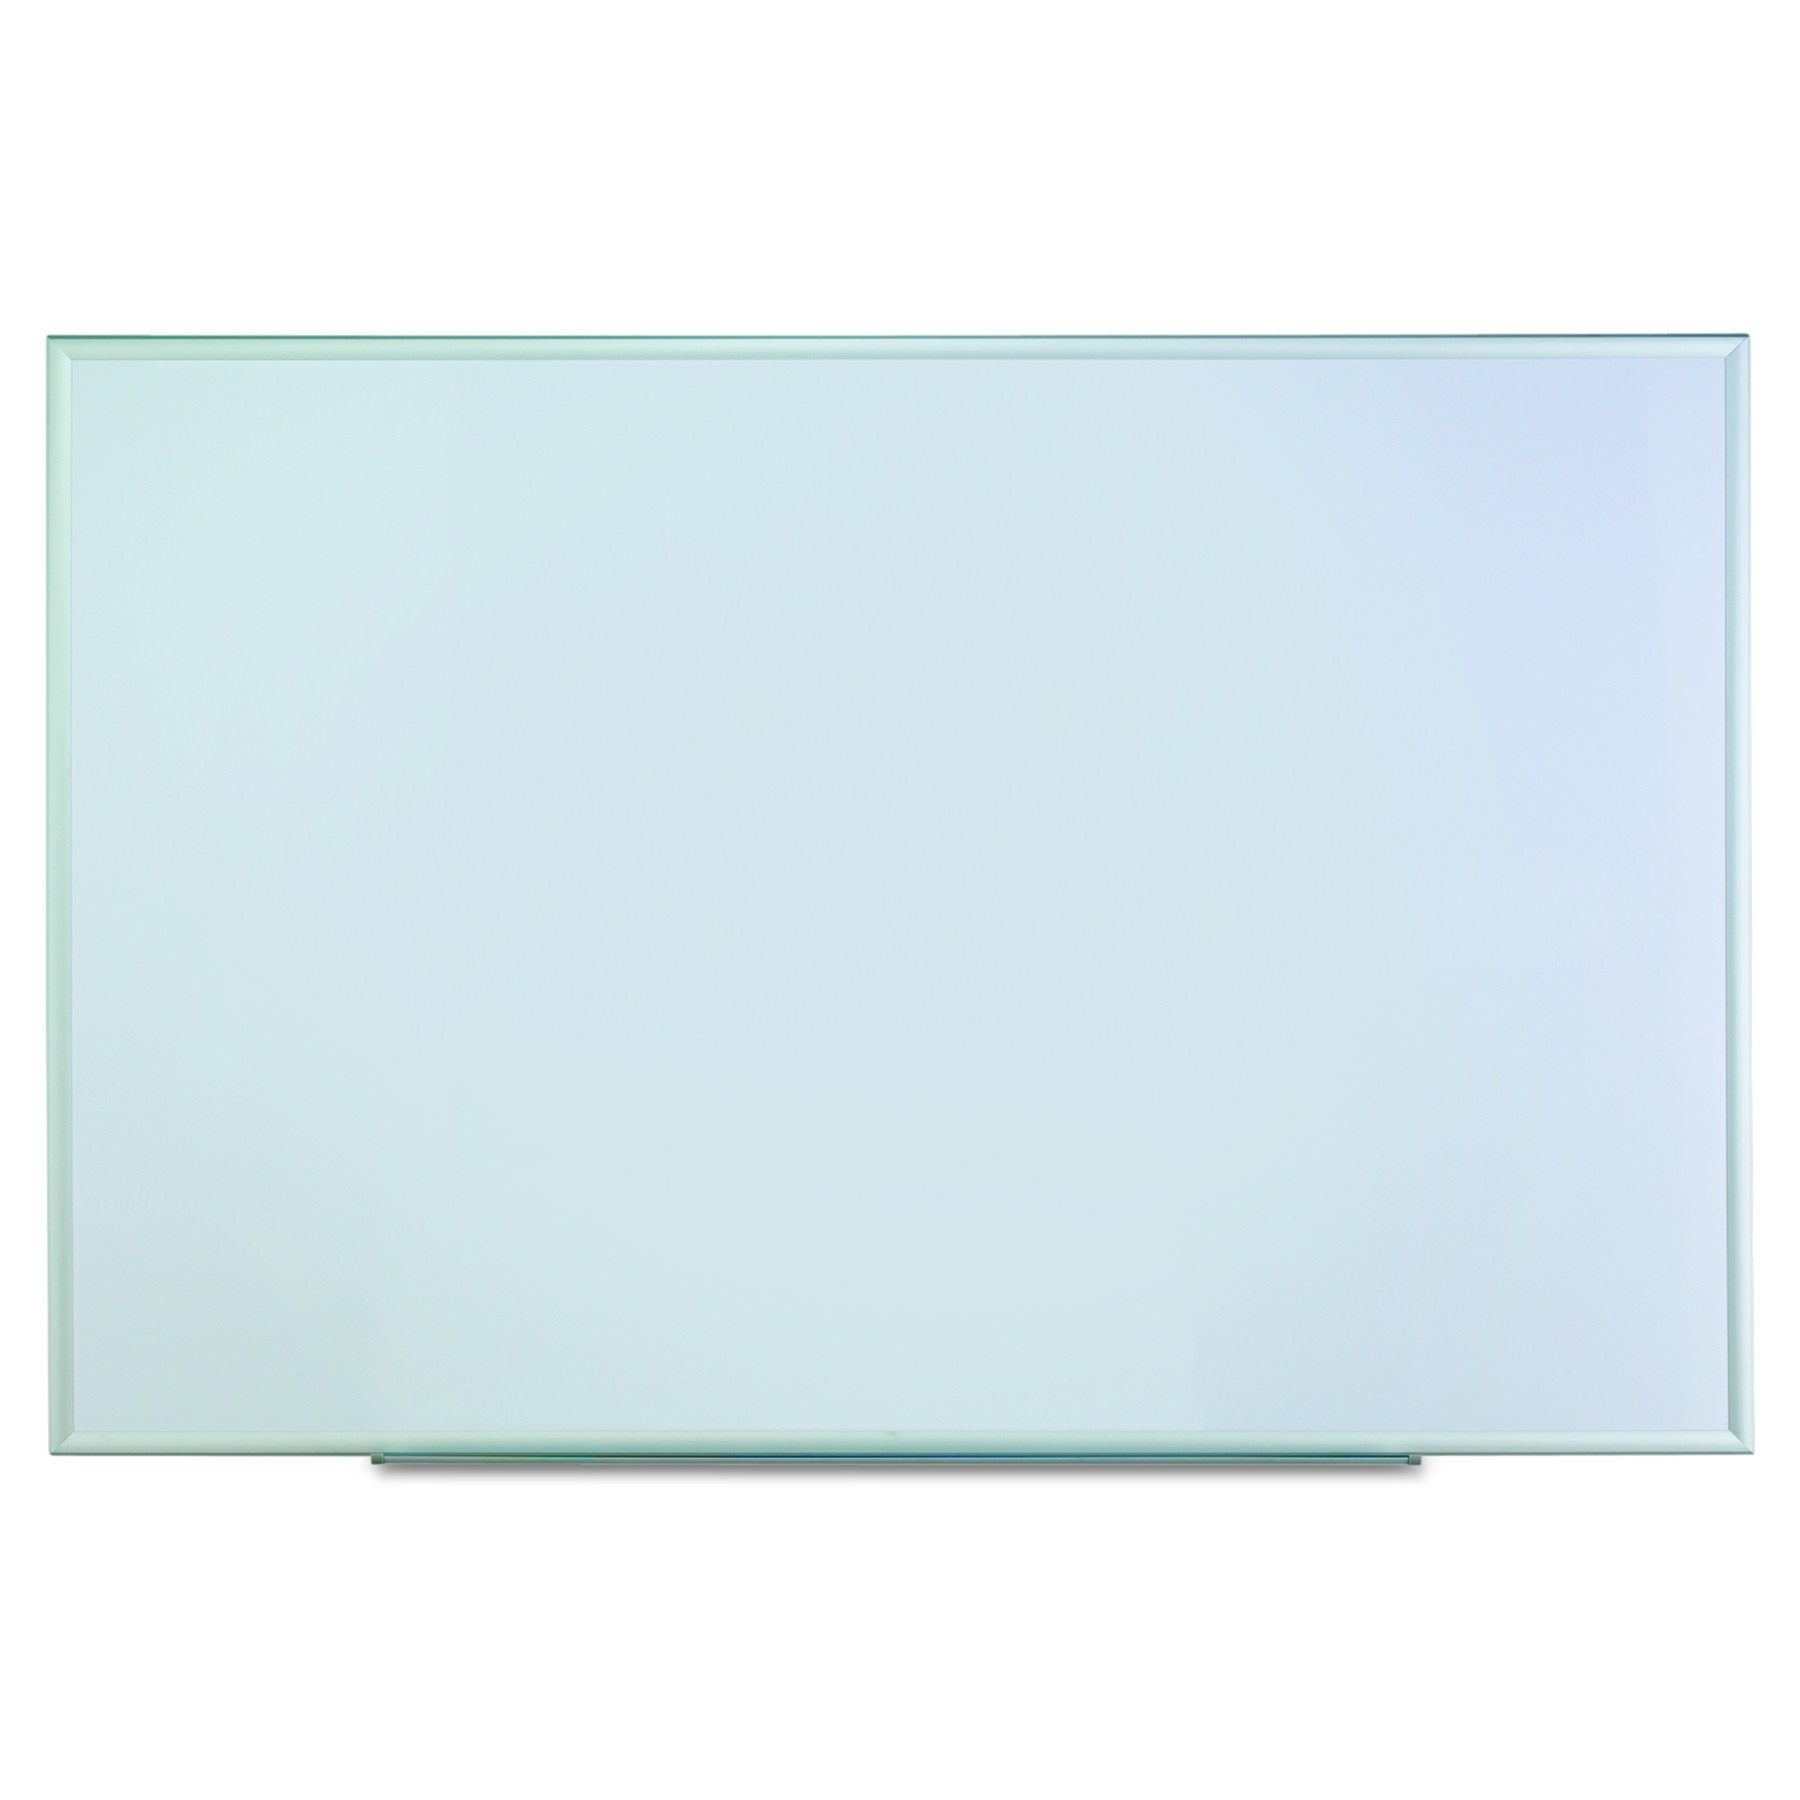 Universal Dry Erase Marker Board, Melamine, 72 x 48, Silver Aluminum Frame